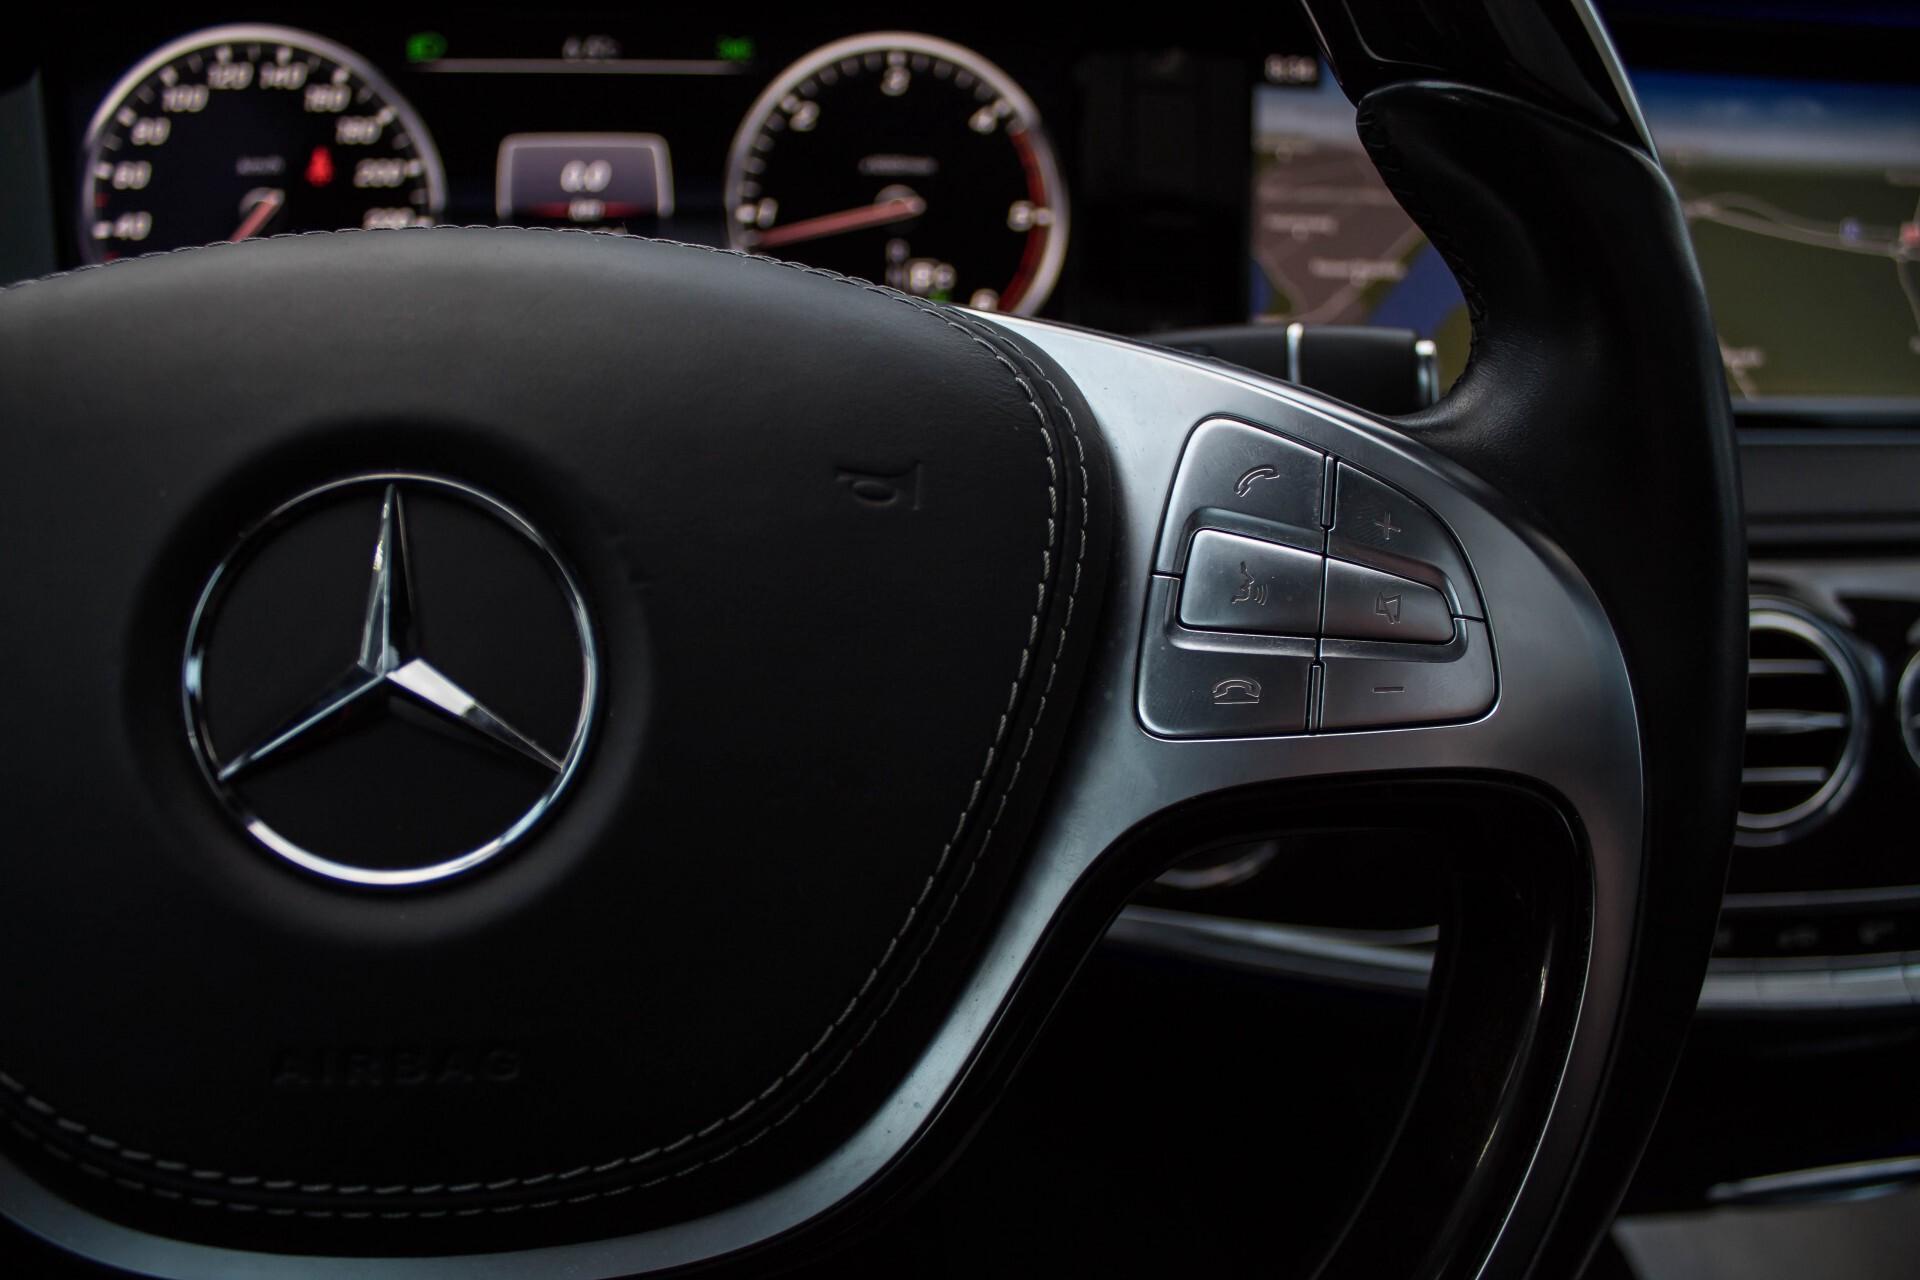 Mercedes-Benz S-Klasse 350 BlueTEC 63 AMG Panorama/Distronic/Keyless/Massage/Burmester Aut7 Foto 17